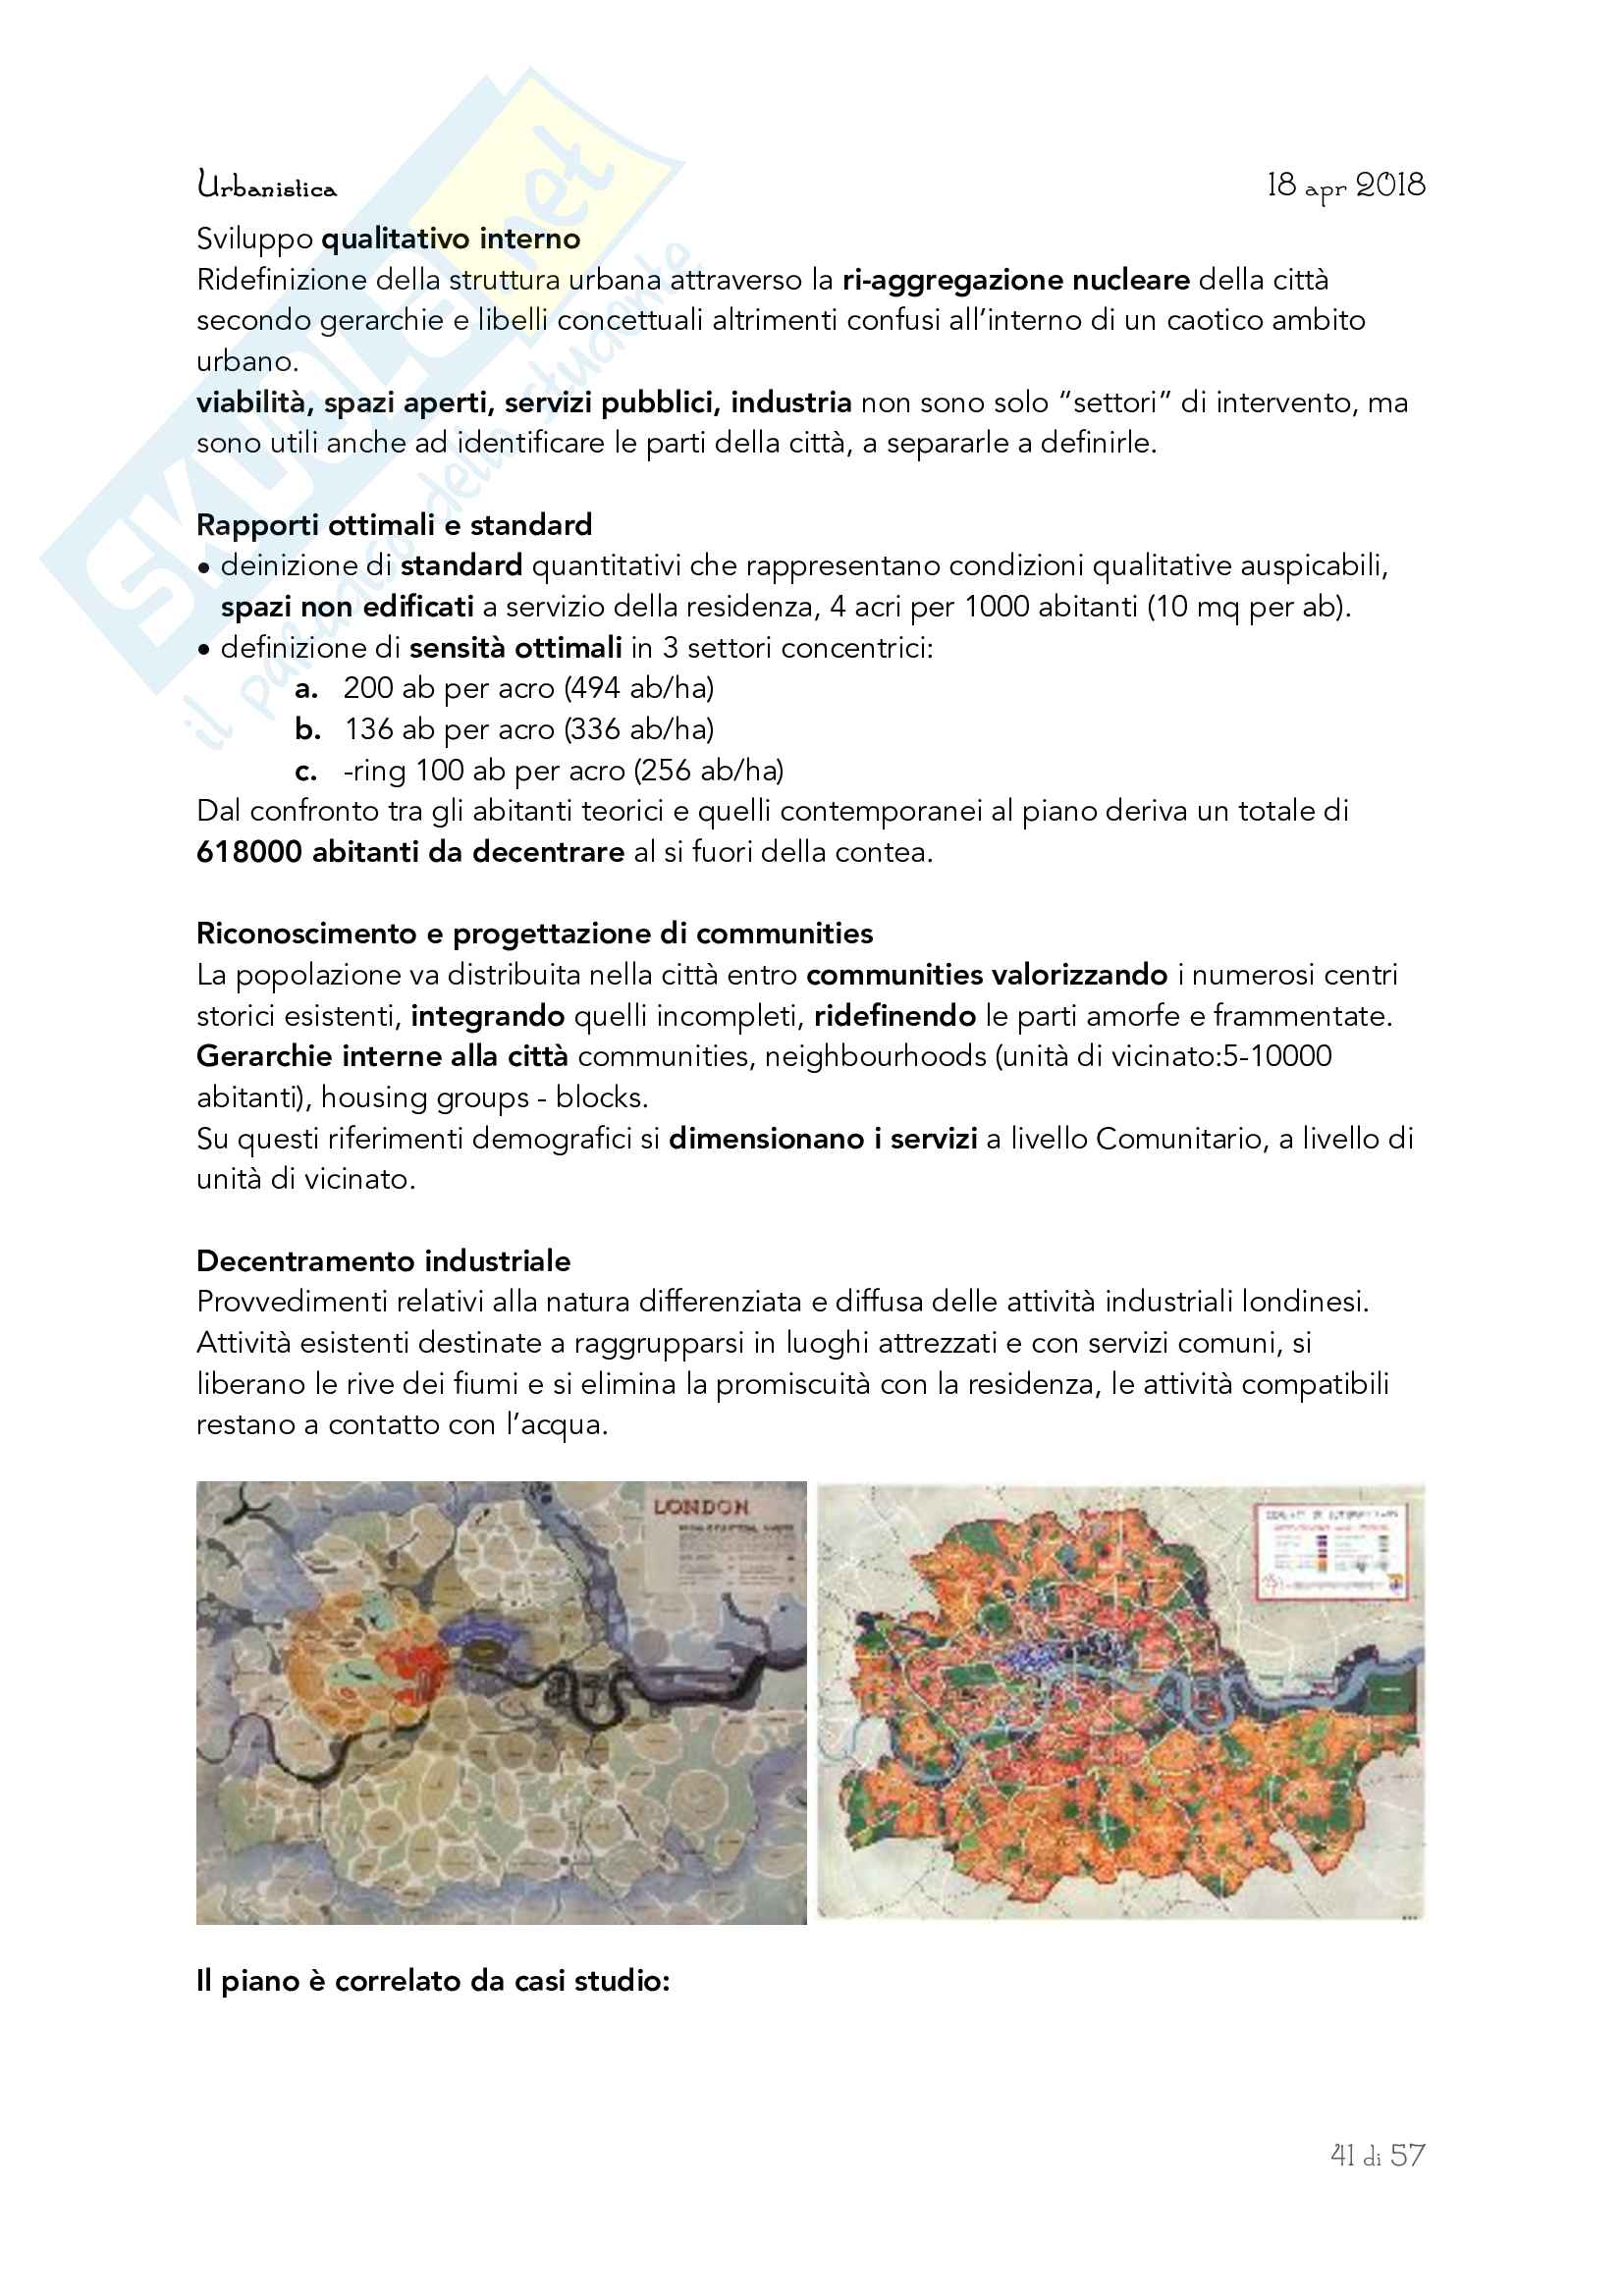 Appunti Urbanistica Pag. 41